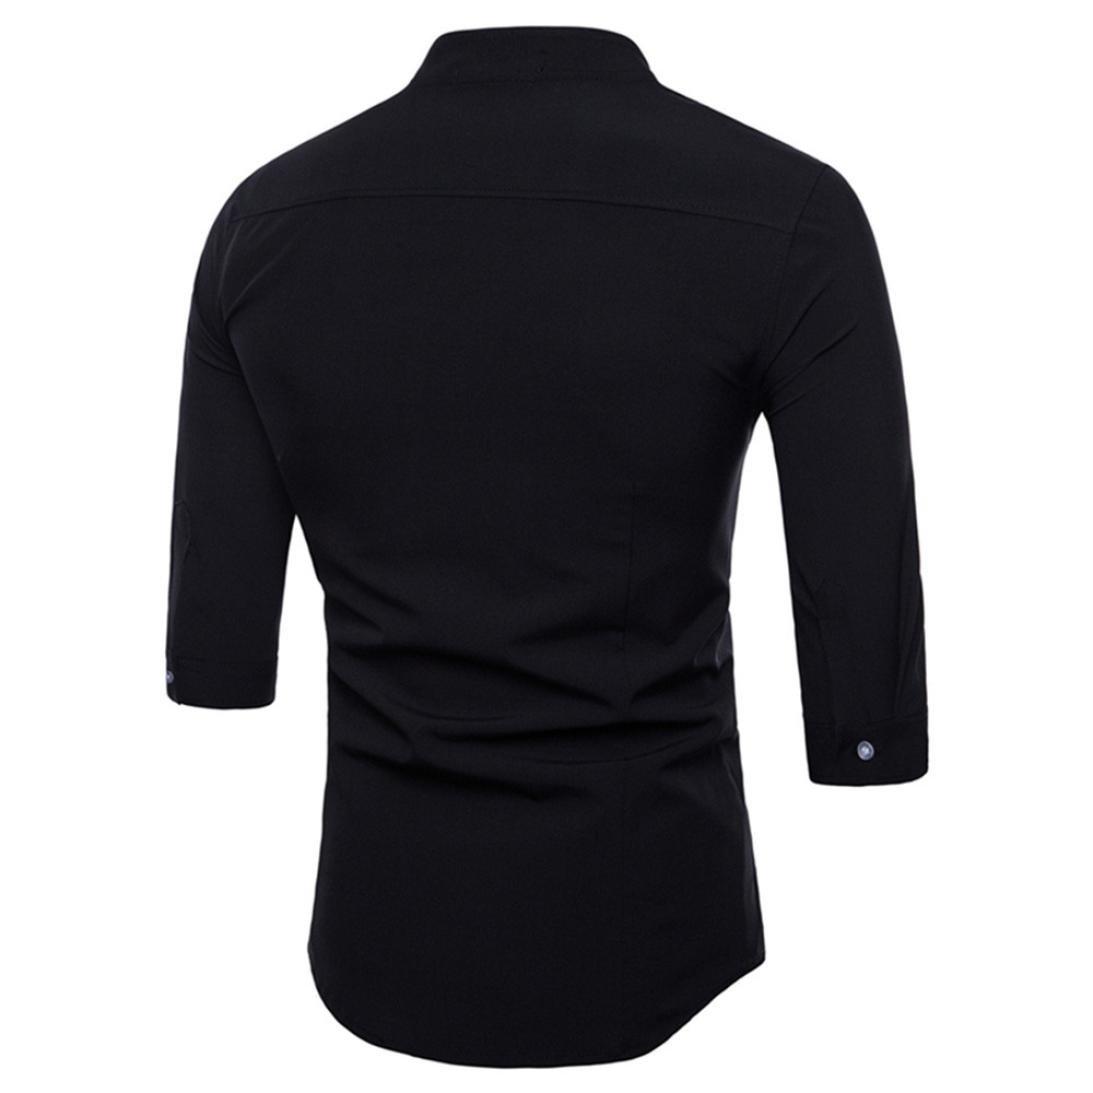 e68576297 BB67 Men's Slim Shirt Casual Half Sleeve Tee Polyester T-Shirt Suits ...